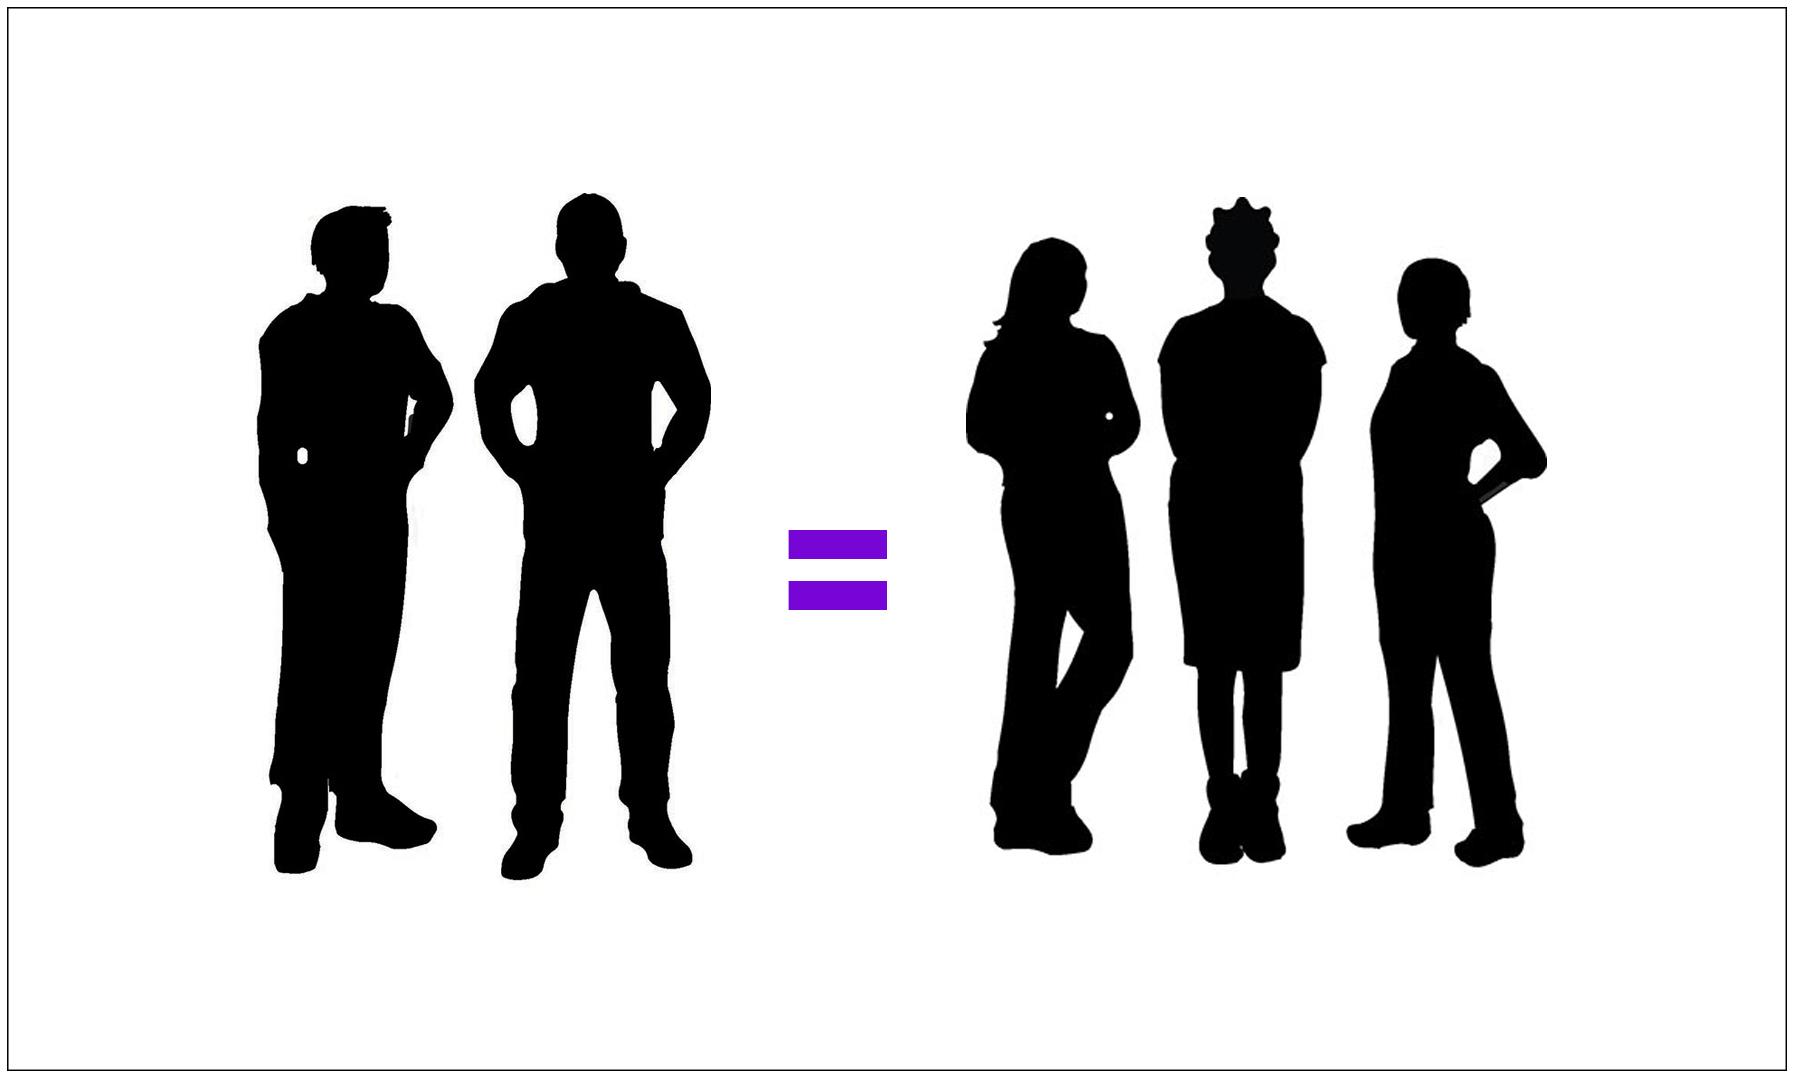 Ratio-men-women-radiation.jpg